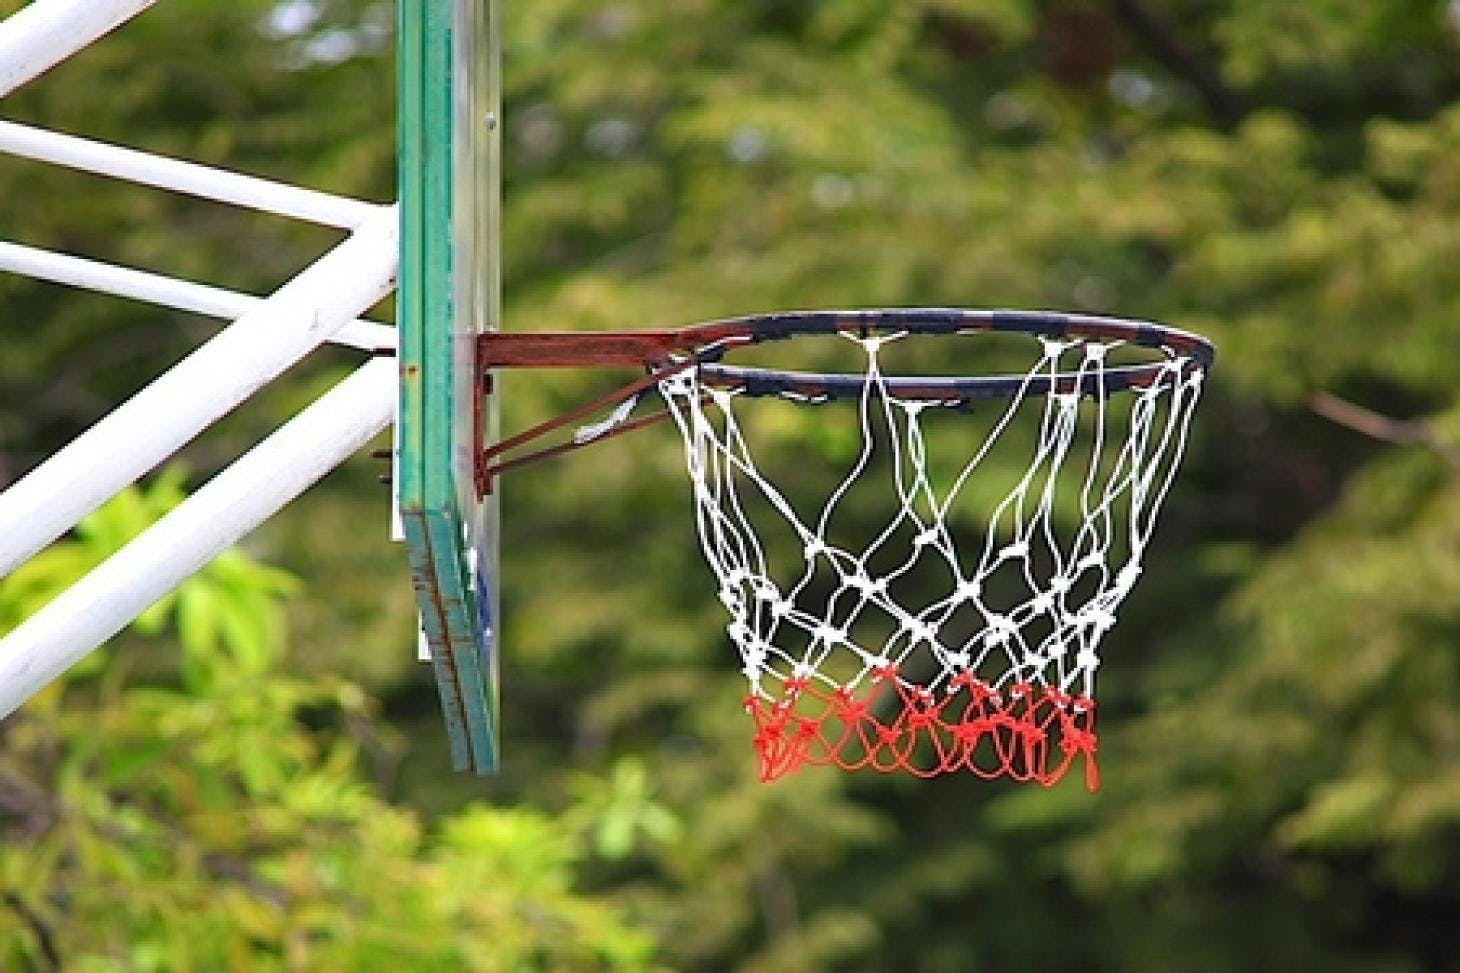 Geraldine Mary Harmsworth Sports Facility Outdoor | Hard (macadam) netball court